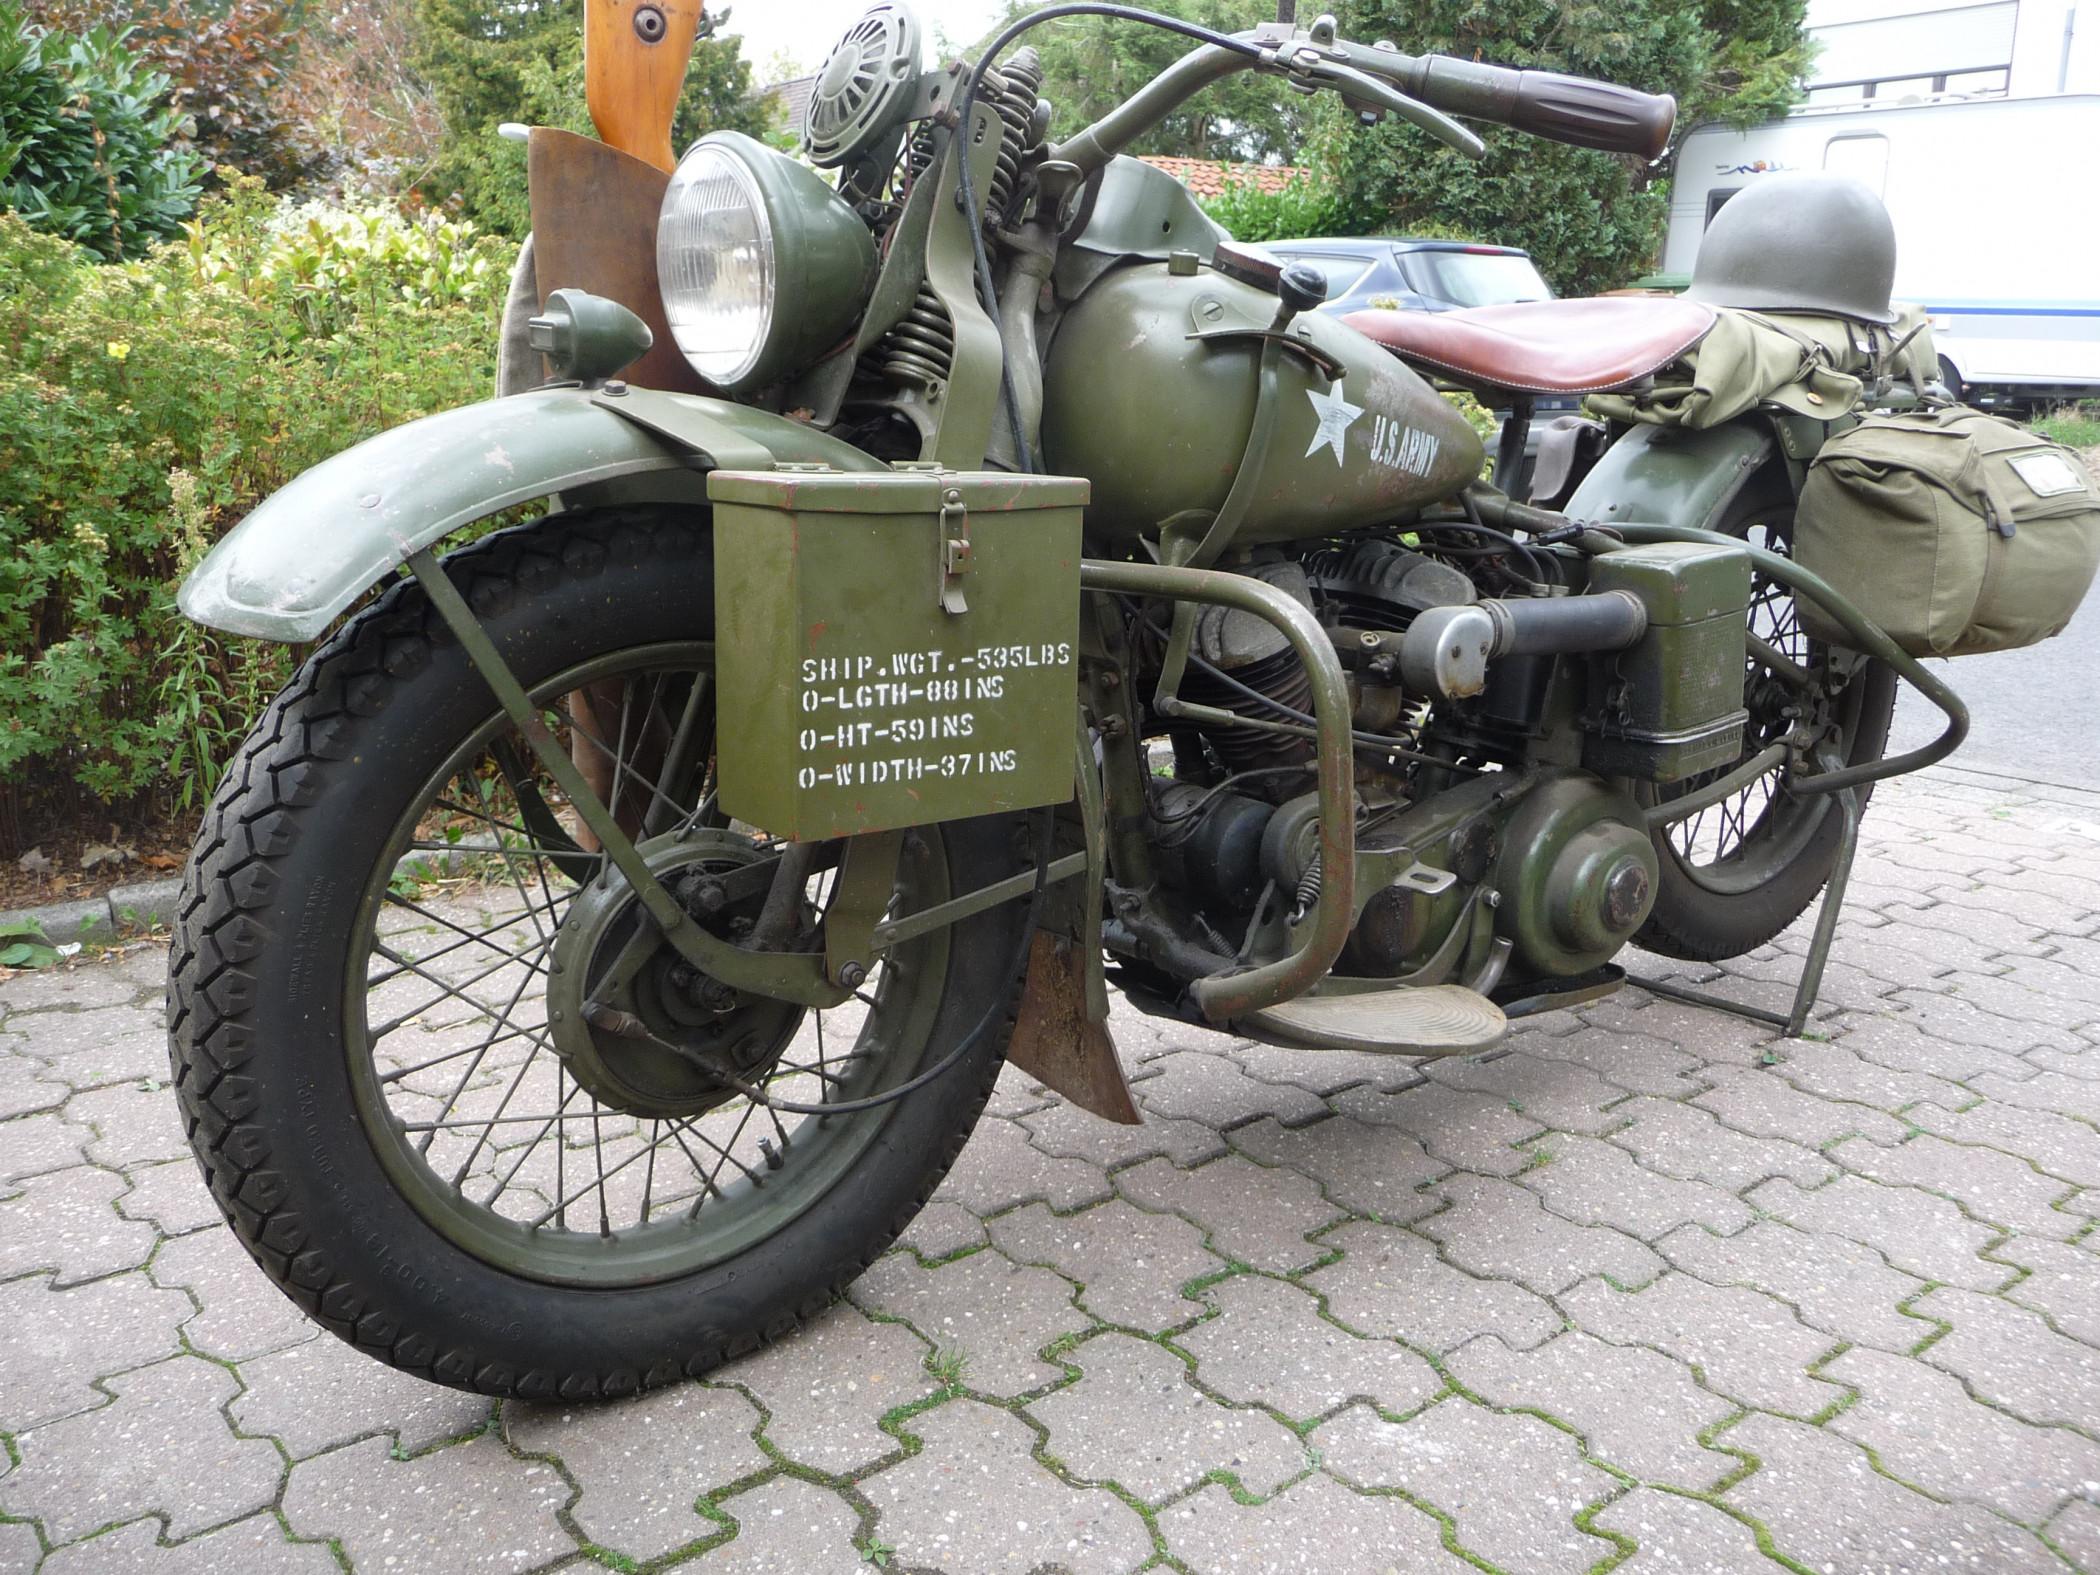 1942 Harley Davidson WLA Military